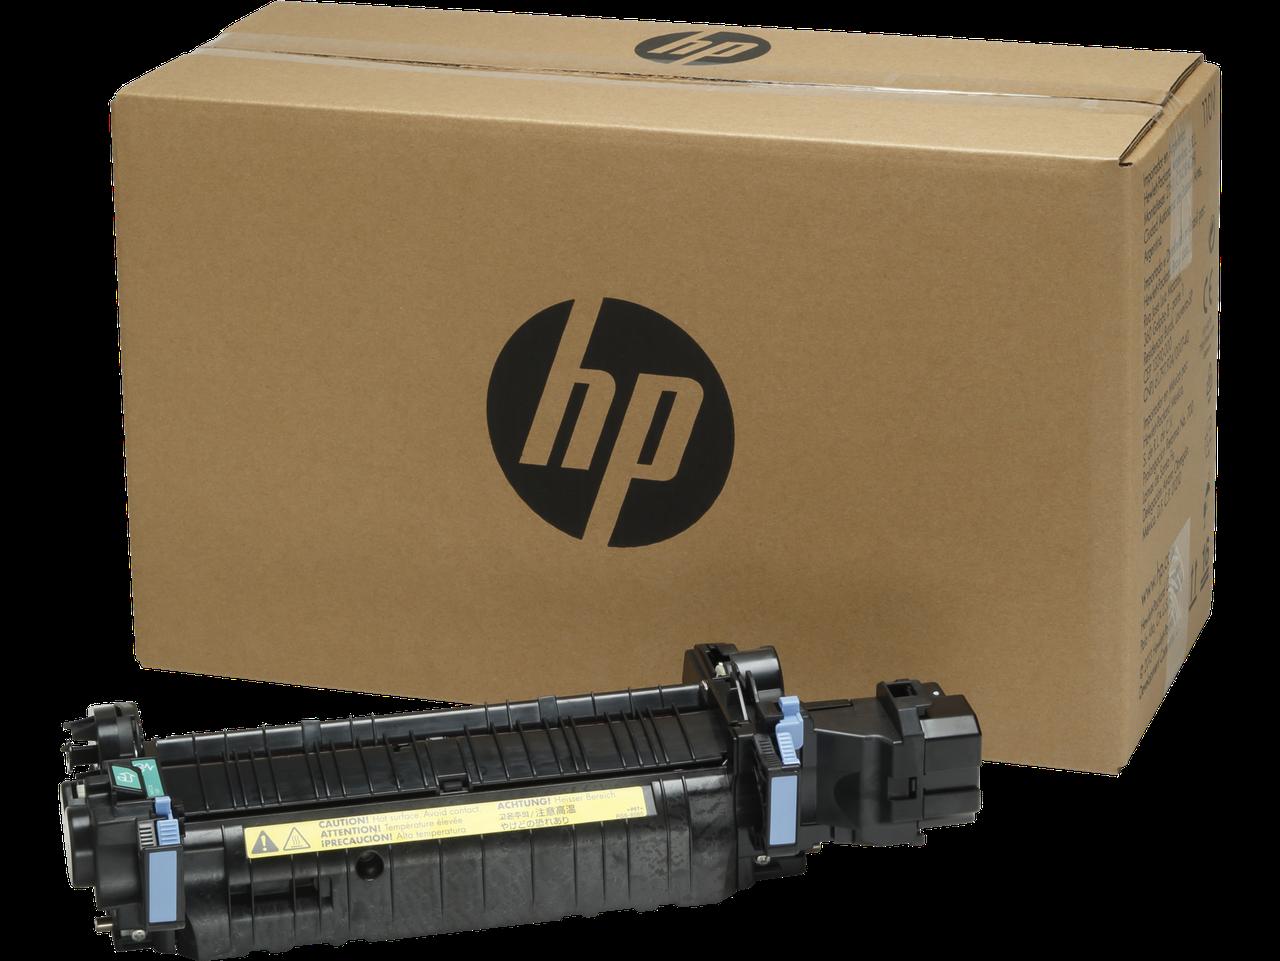 HP CE247A Комплект термофиксатора цветной  220 В Fuser Kit для CP4025, CP4525, and M651 Series Printers